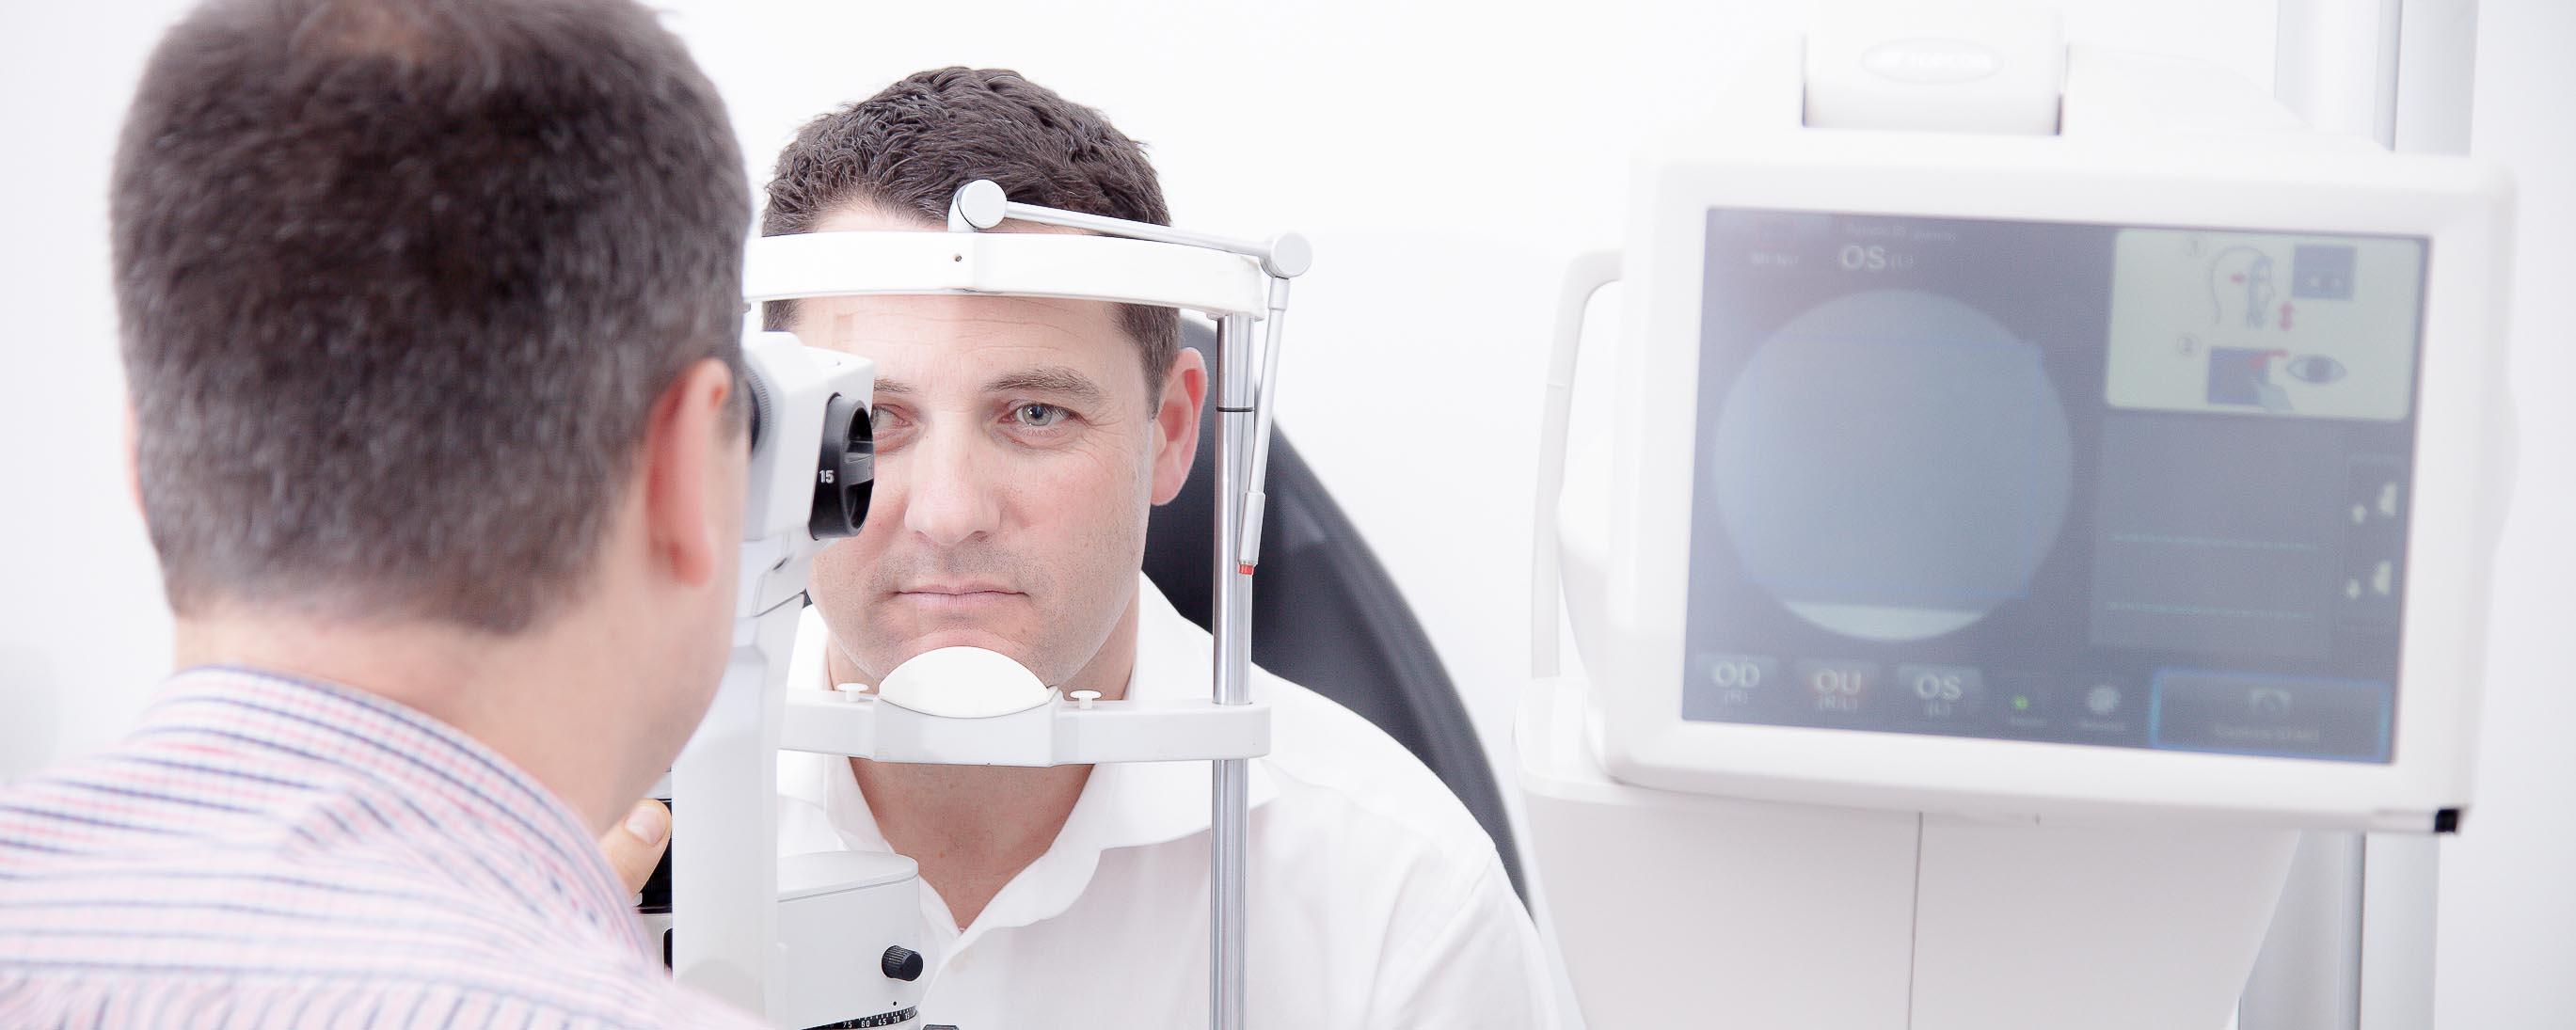 Eye test with Paul Akers Eyes of Bright Optometrist